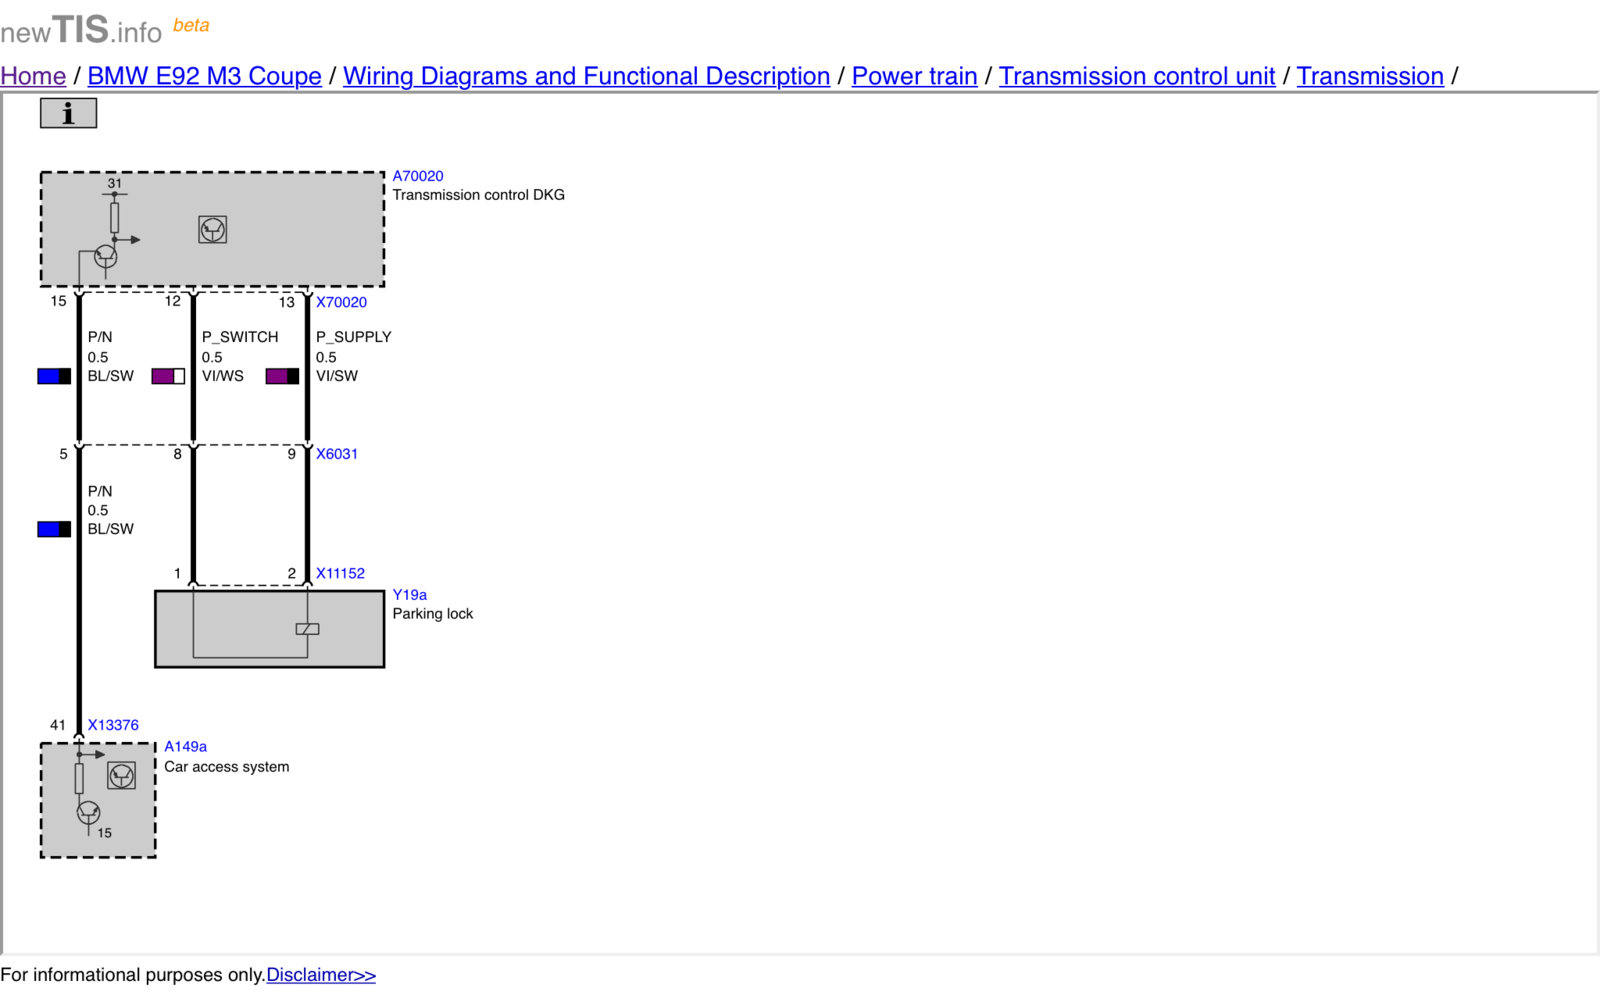 AD9B13B0-187F-4CA8-BF06-8AB4845CDE5A.jpeg